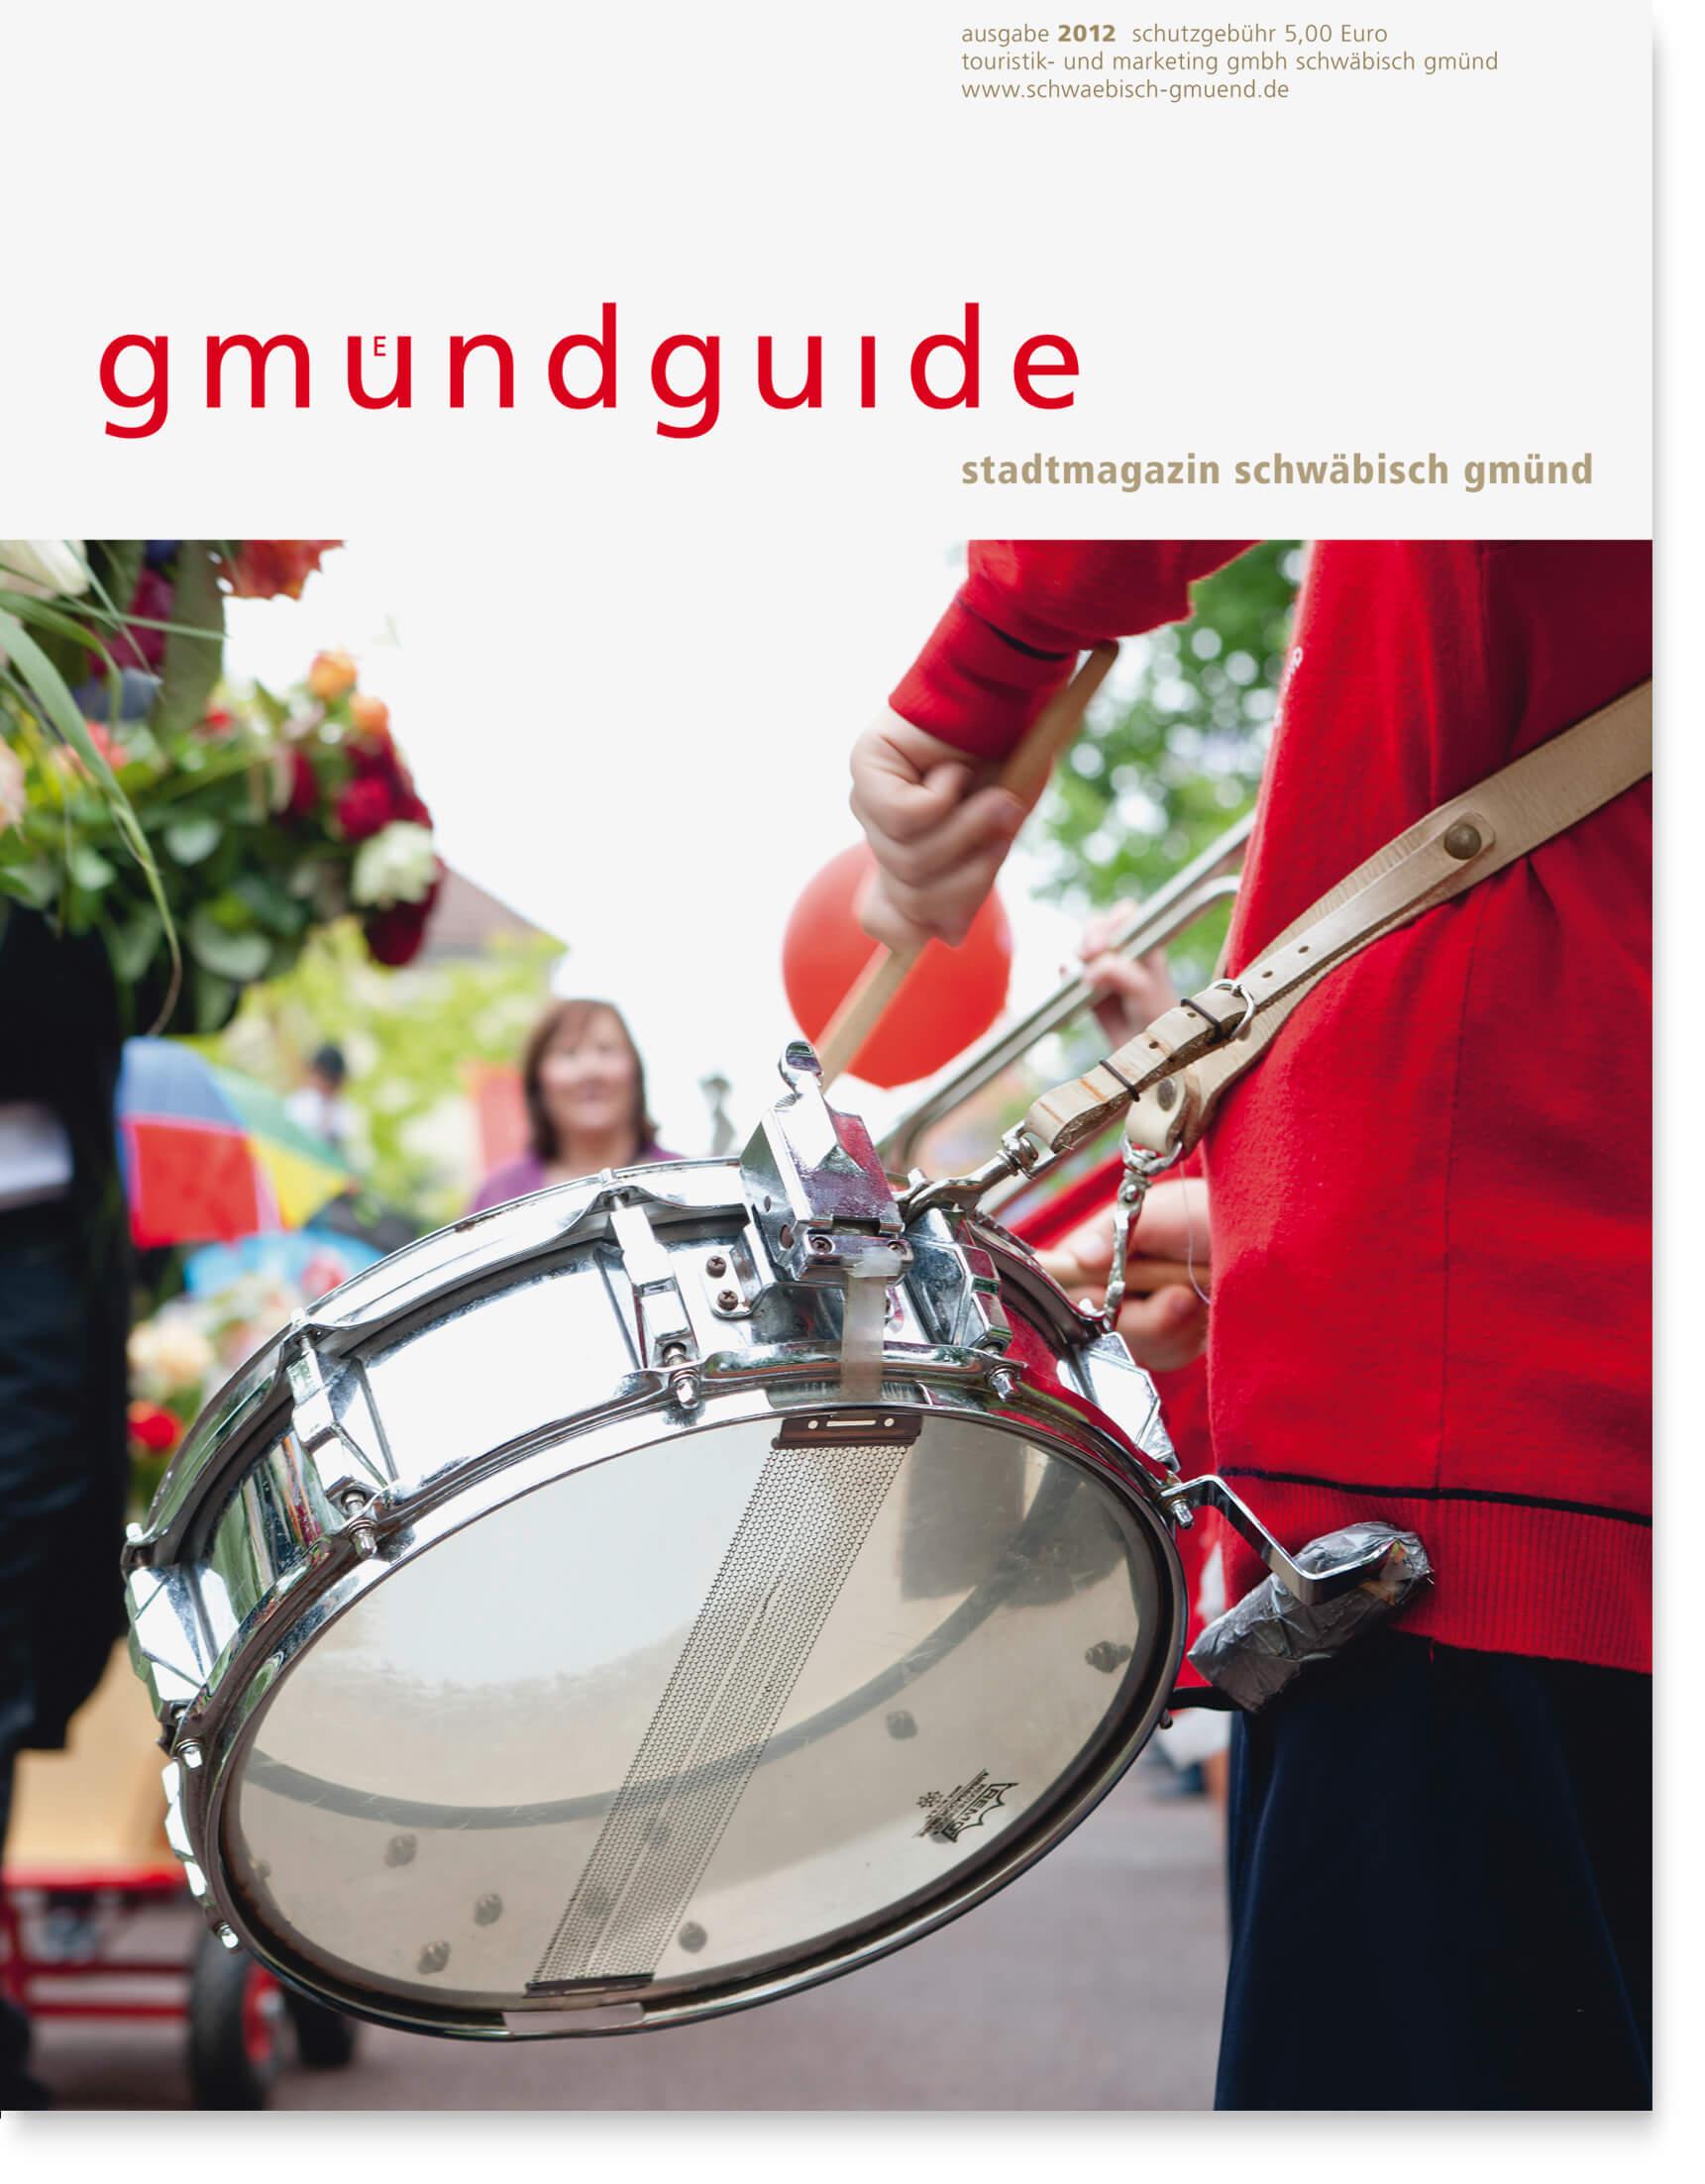 fh-web-gmuendguide-2012-1.jpg